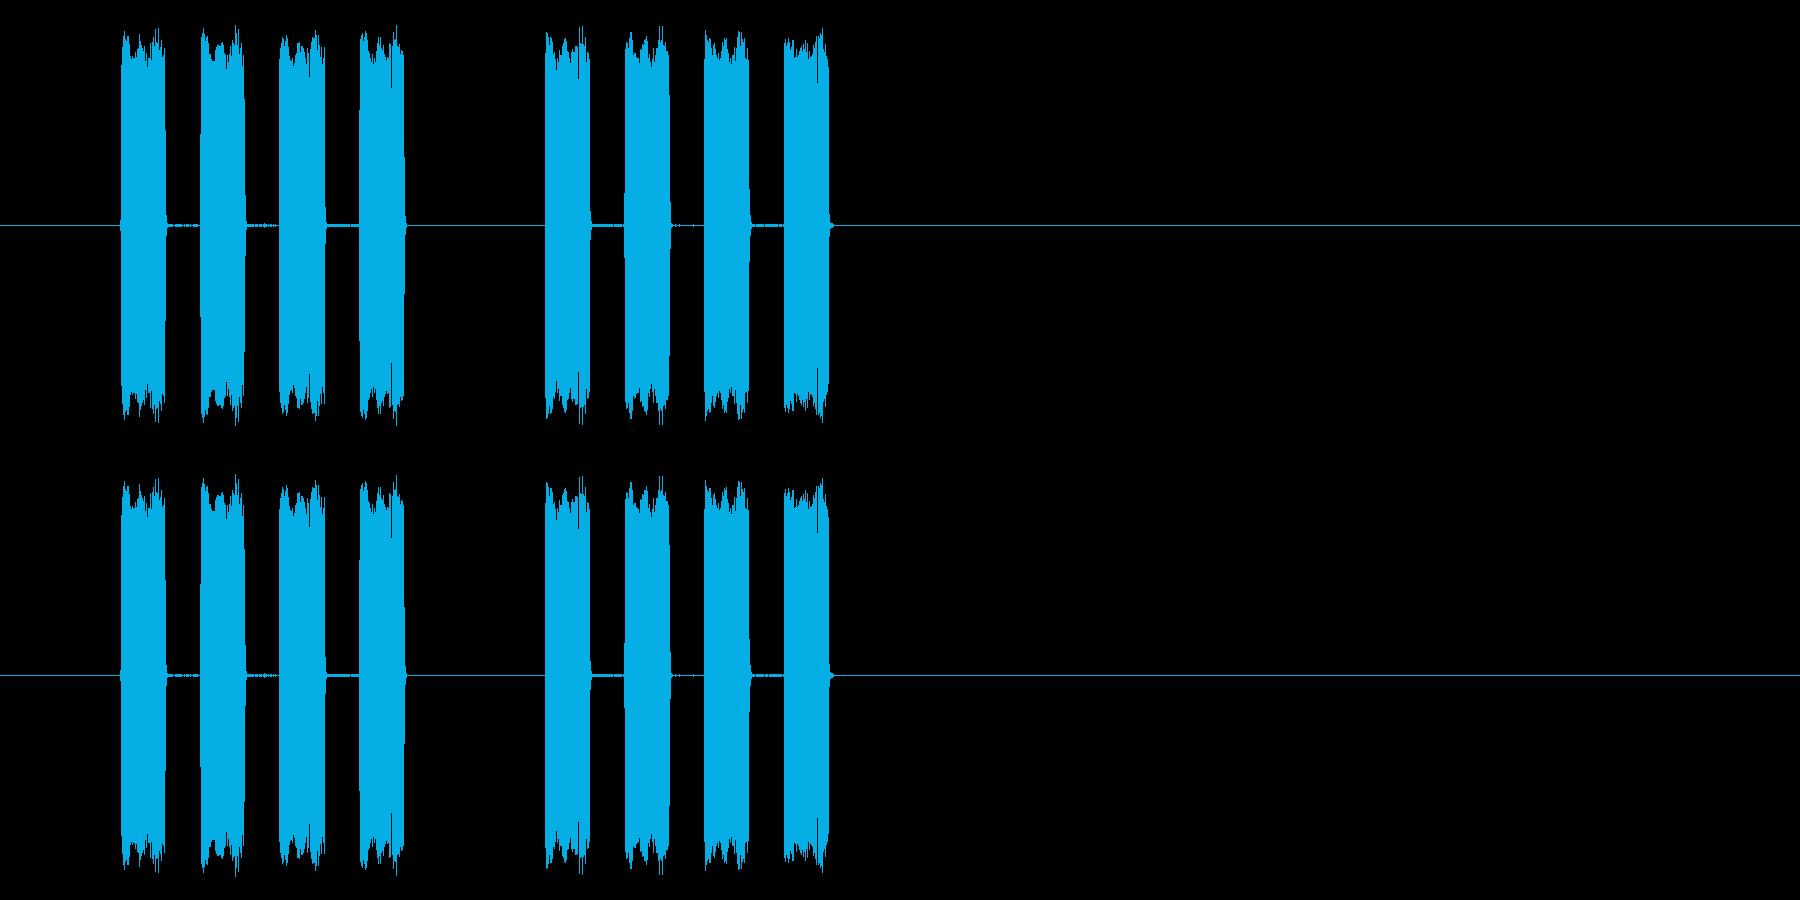 【GB 格闘01-14(メッセージ)】 の再生済みの波形